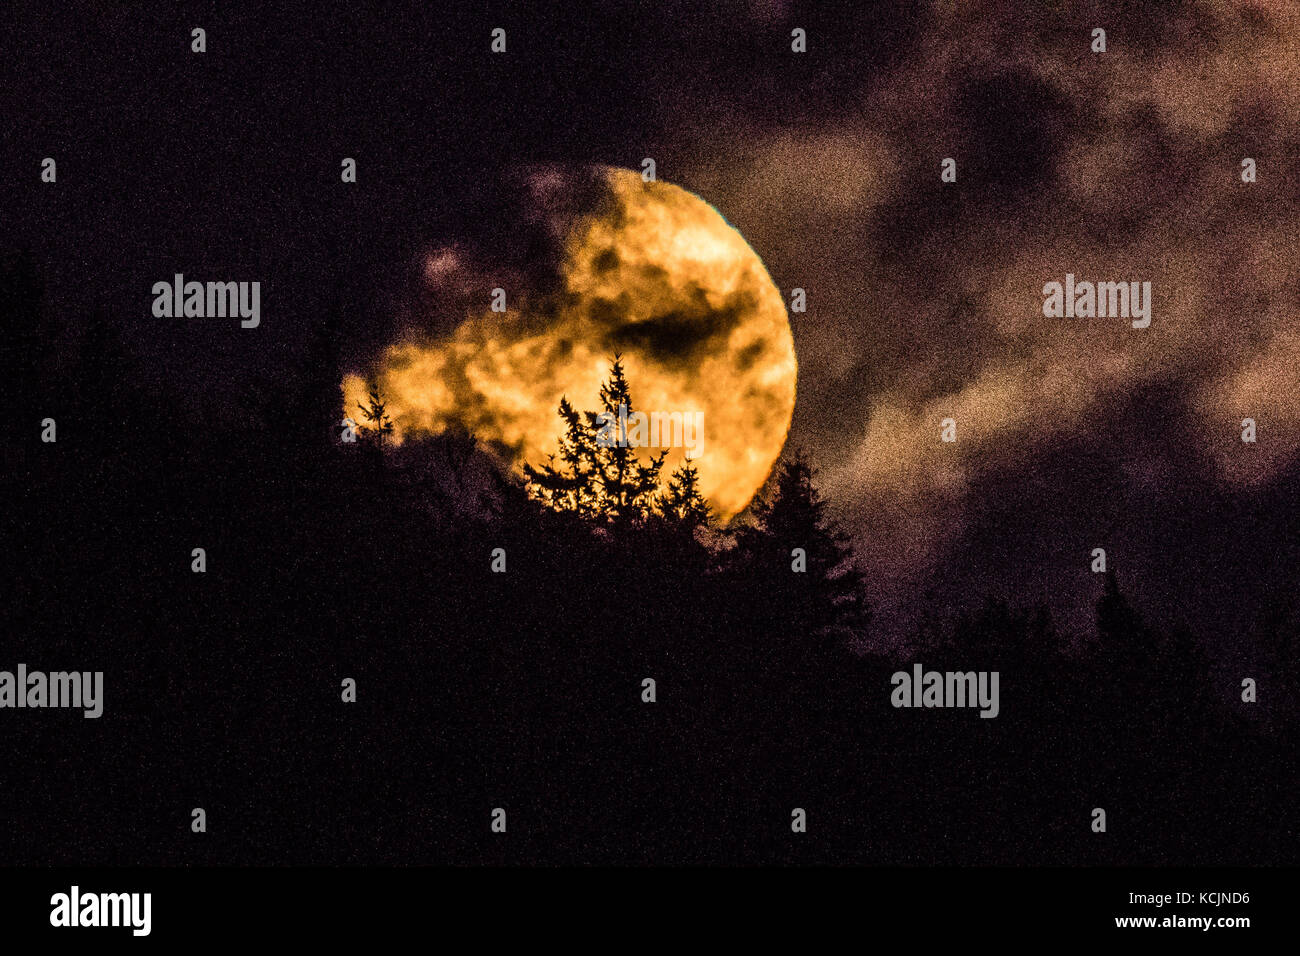 Aberystwyth Wales UK, Thursday 05 October 2017 UK Weather: A glorious 'Harvest Moon' full moon rising dramatically - Stock Image